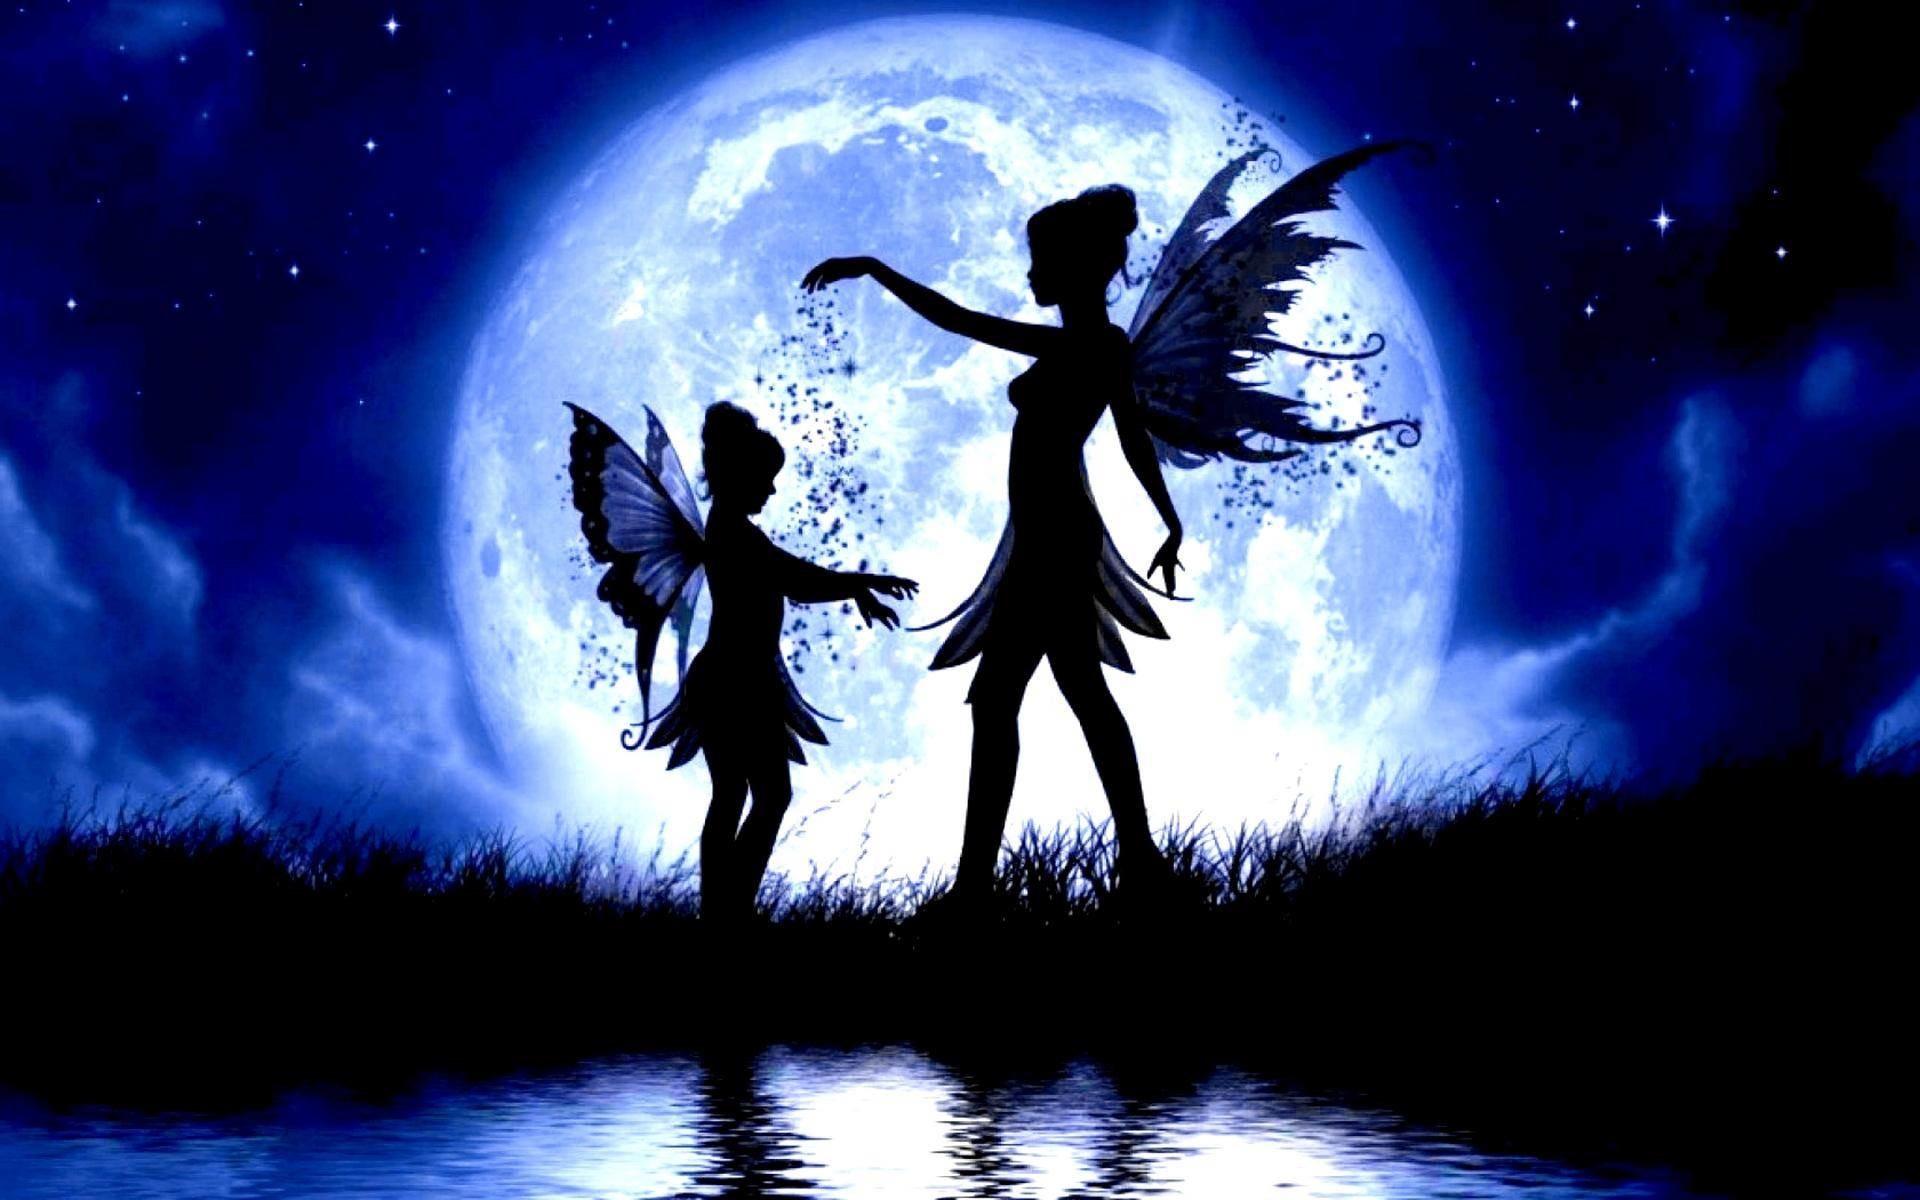 Disney Fairies HD Wallpapers HD Wallpapers Pop 1024×768 Animated Fairy  Wallpapers | Adorable Wallpapers